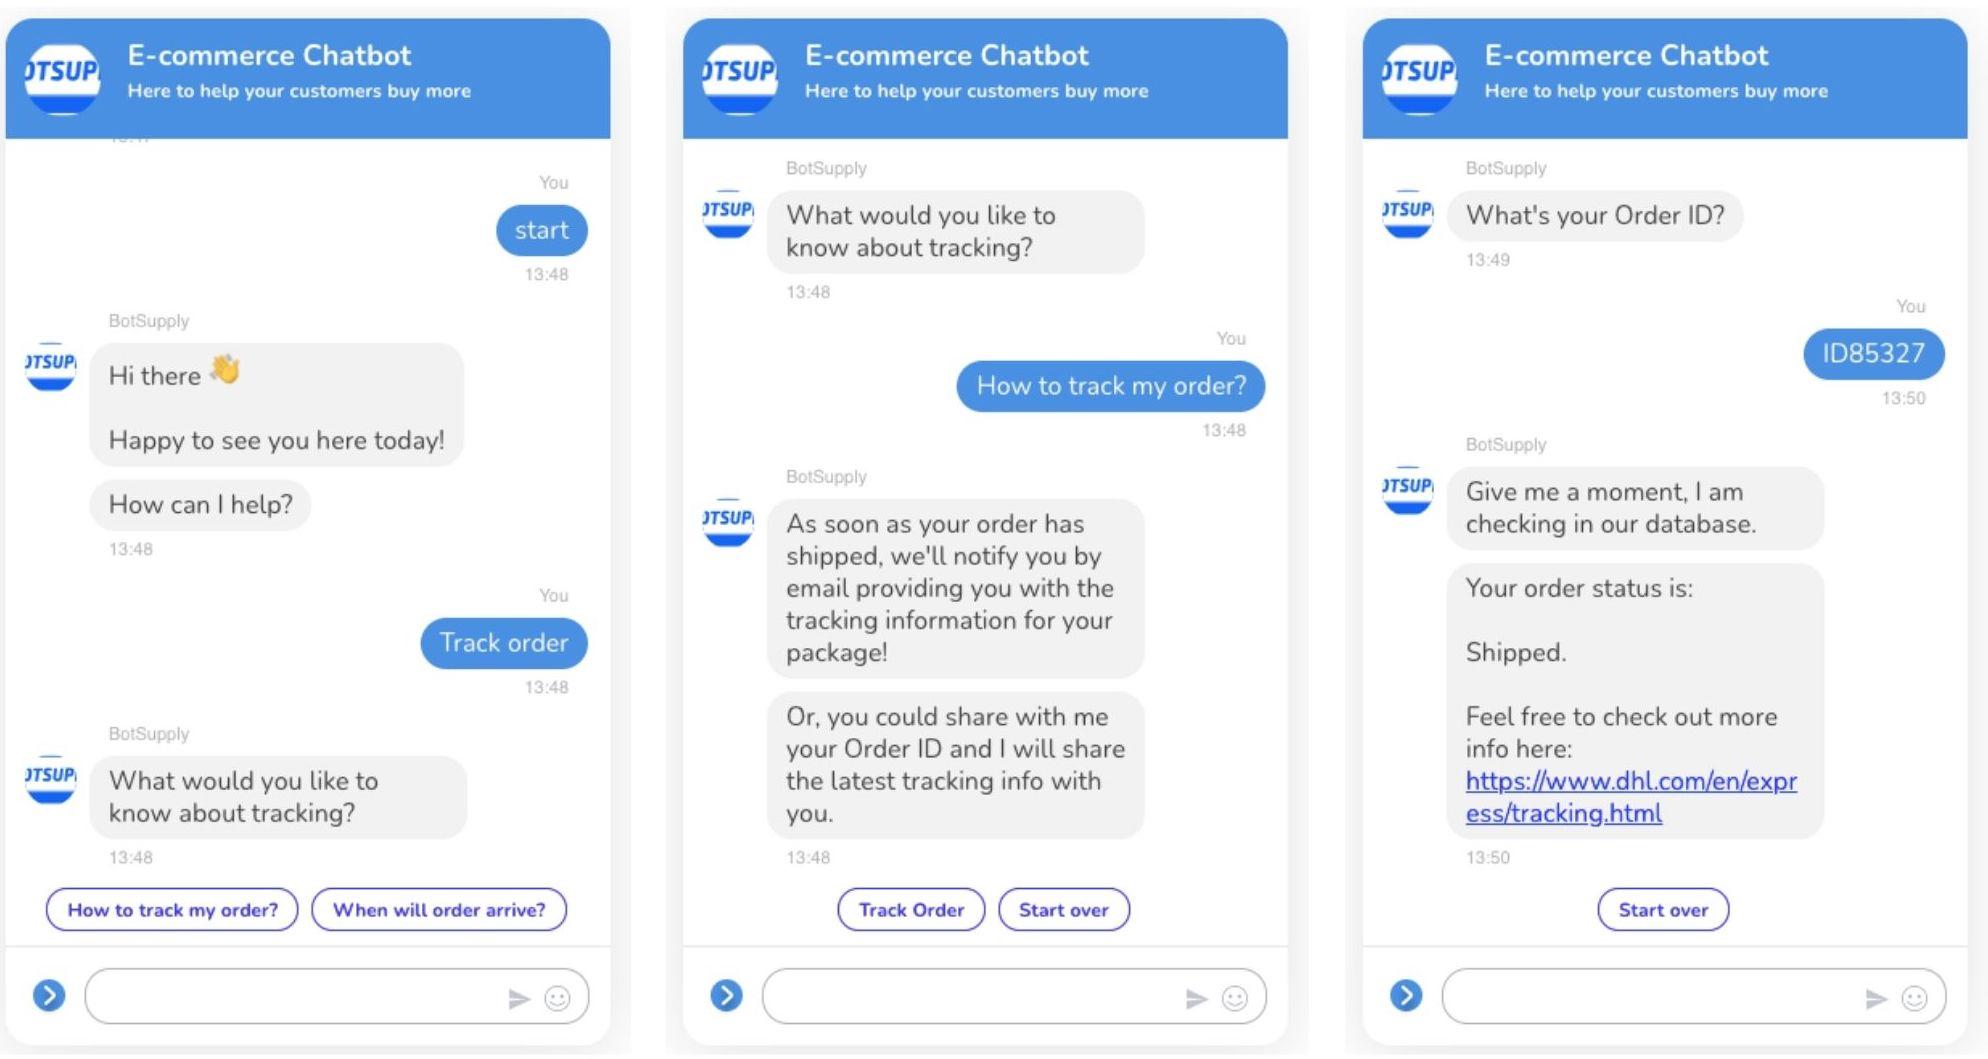 BotSupply E-commerce Chatbot: Tracking Order